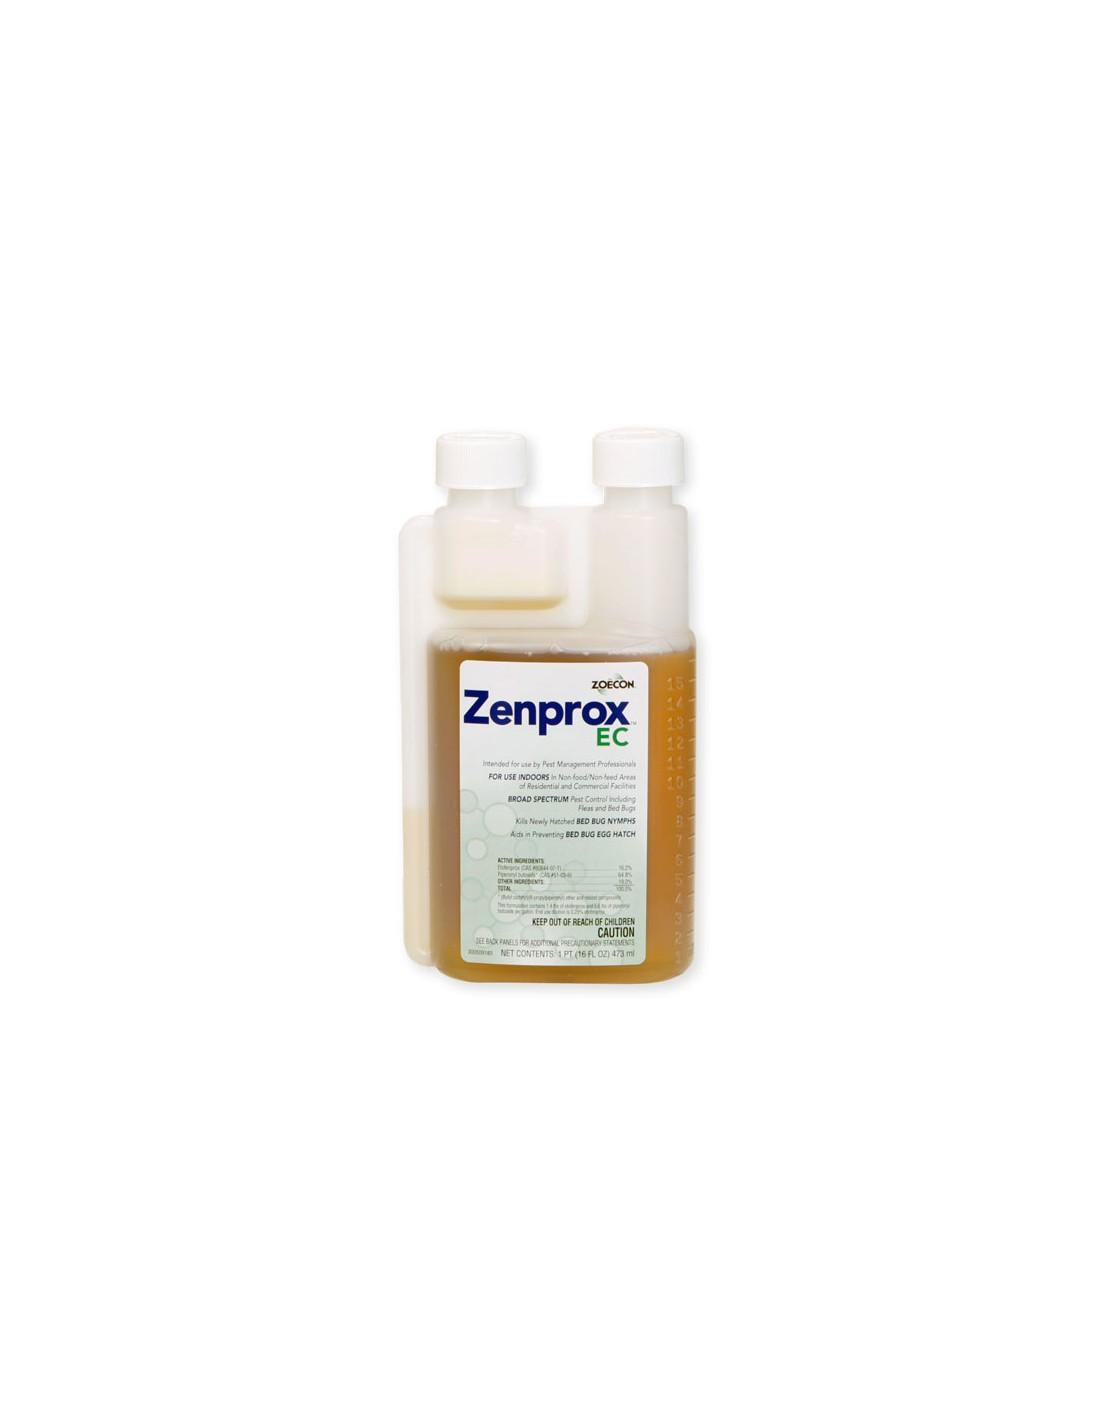 Zenprox EC Questions & Answers